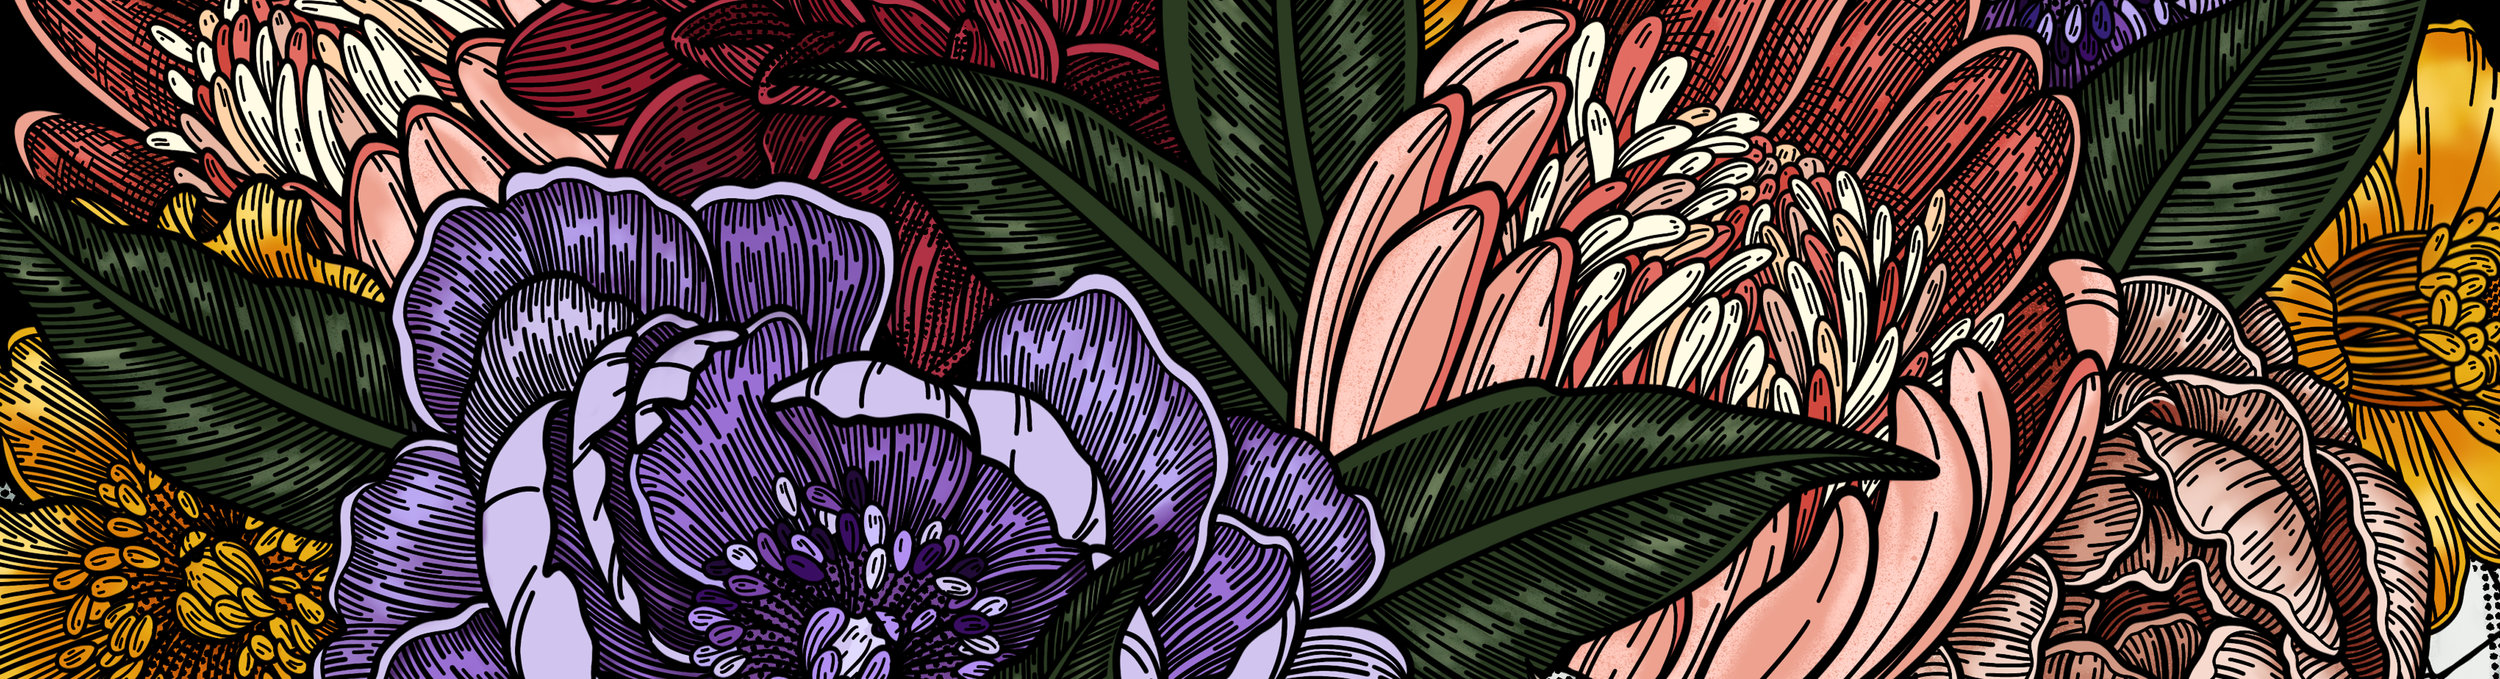 PRINT STUDIO - A lifestyle collection of botanical goods, inspiration, design, art, and custom work.